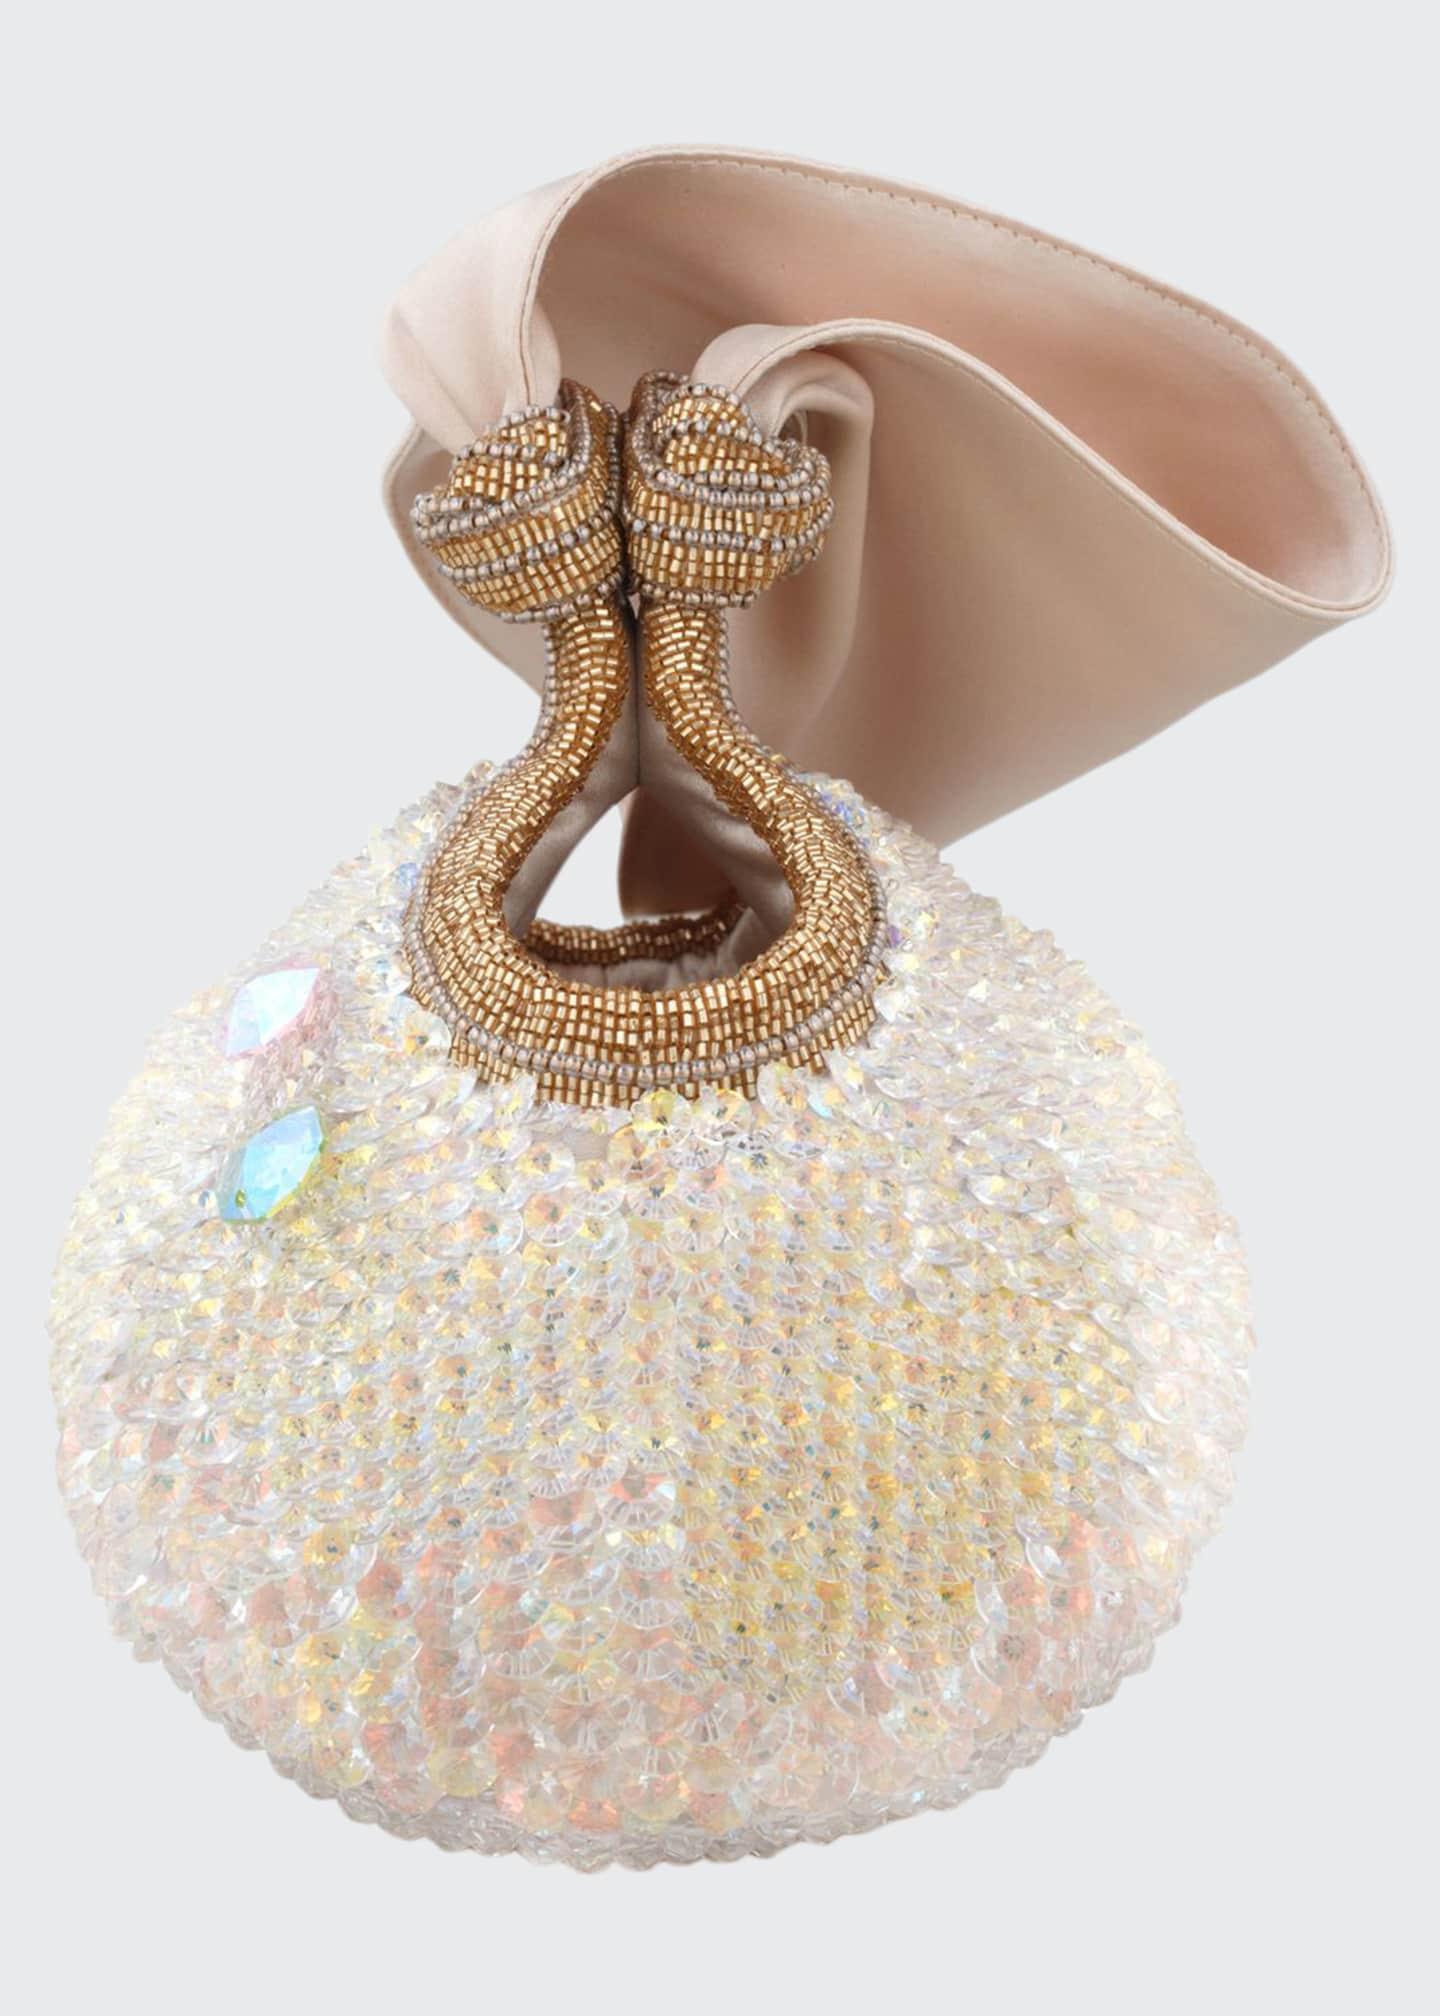 Bea Valdes Bella Lily Crystal Ball Clutch Bag